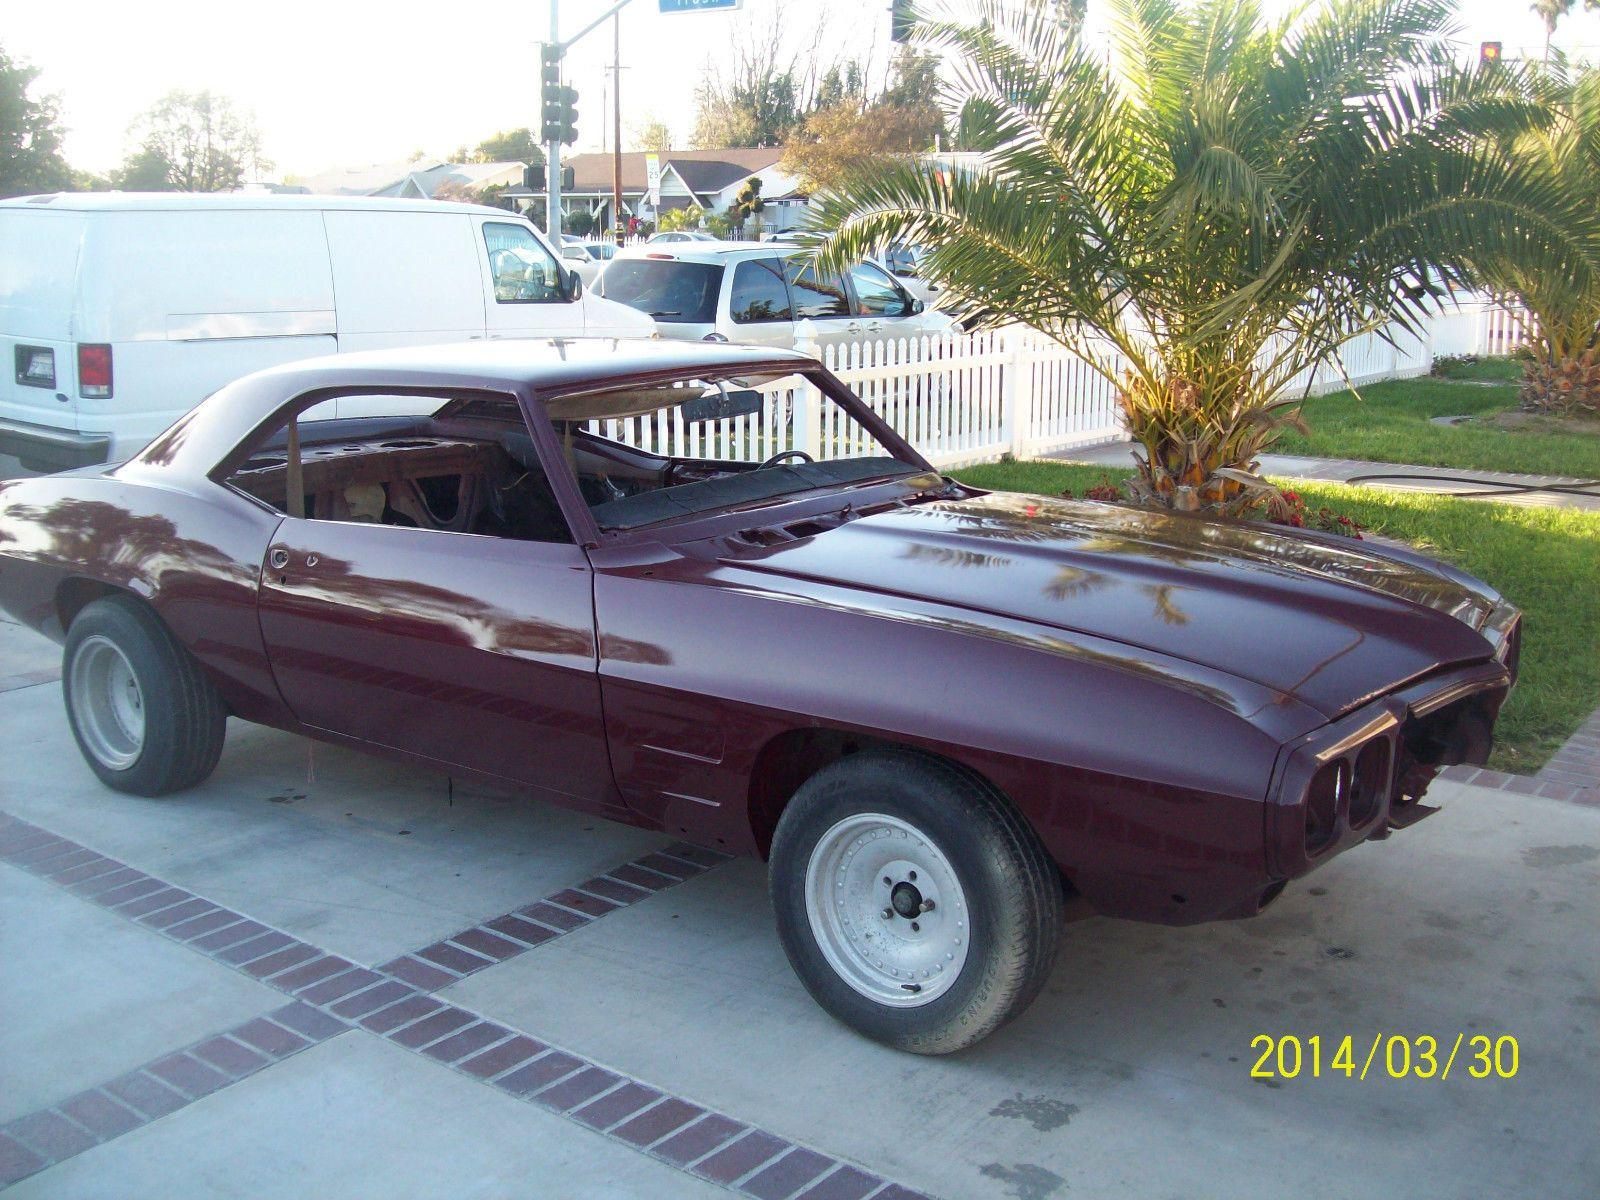 1969 Pontiac Firebird Project Car For Sale   Pontiac Firebird ...